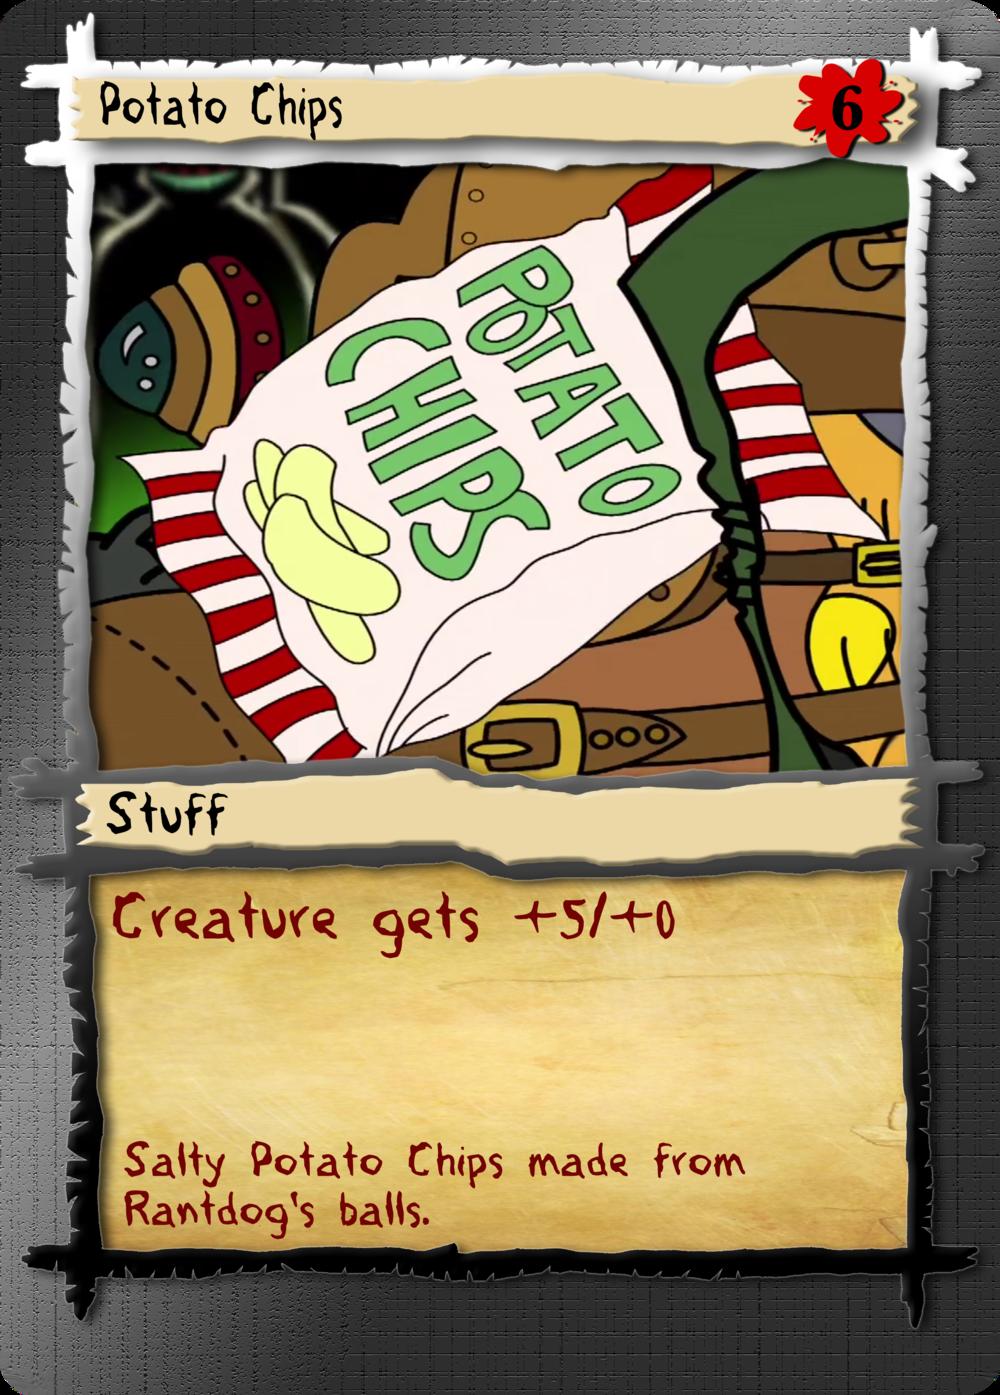 19_Potato Chips.png